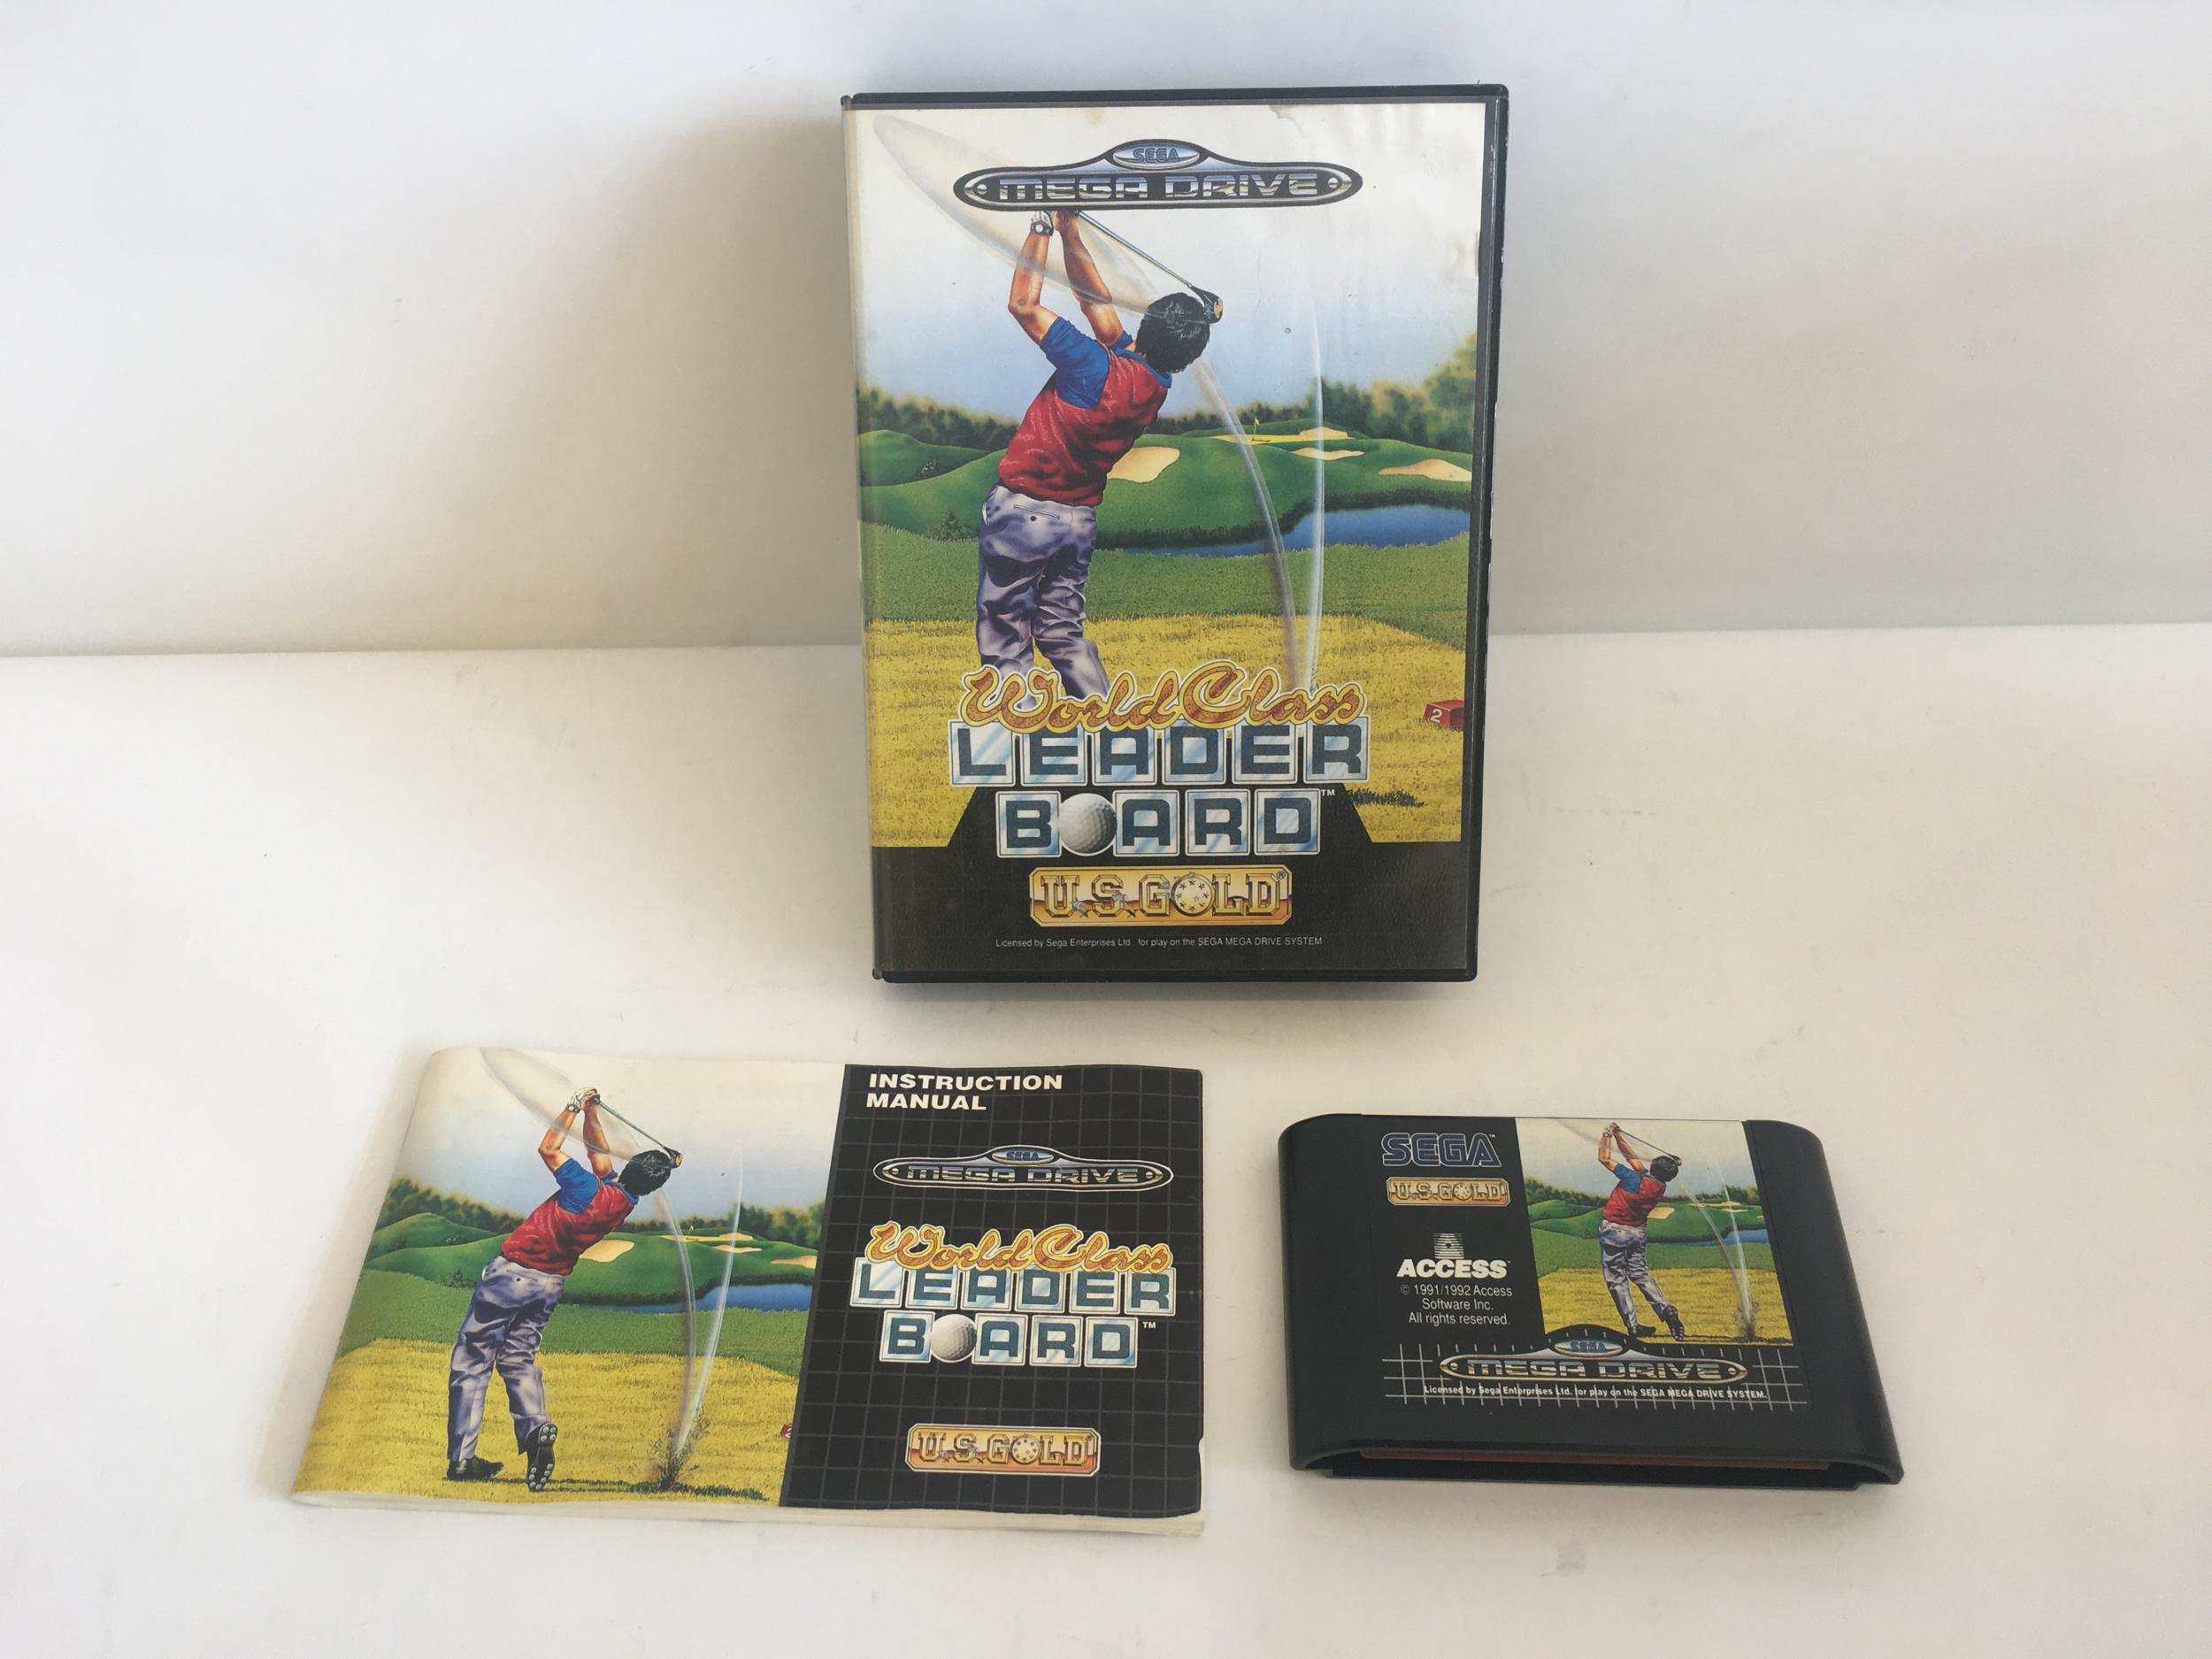 World Class Leader Board US Gold Mega Drive